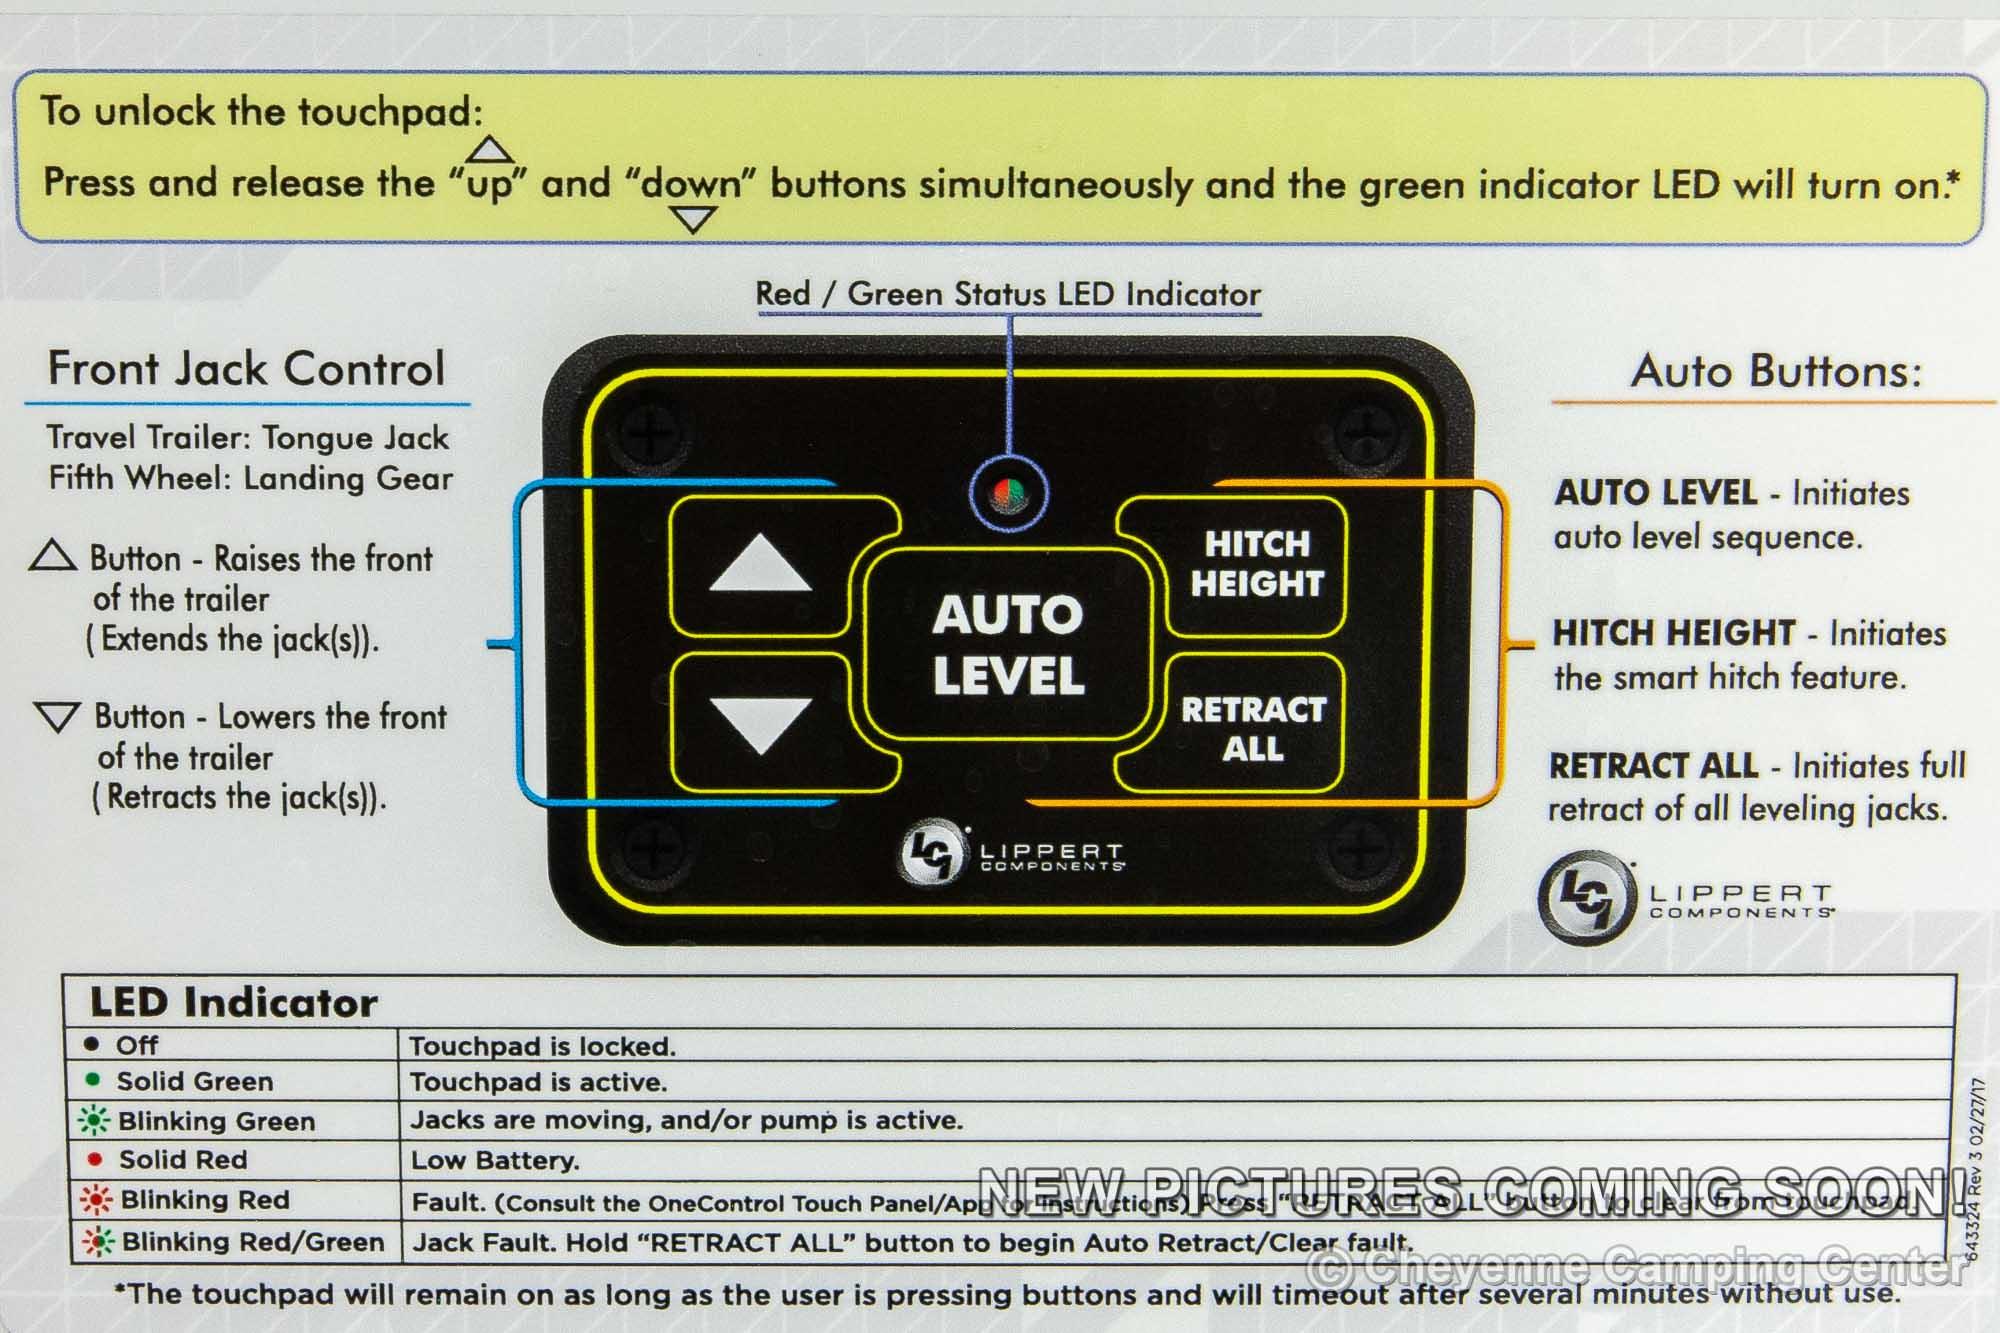 2022 Forest River Sabre Cobalt Edition 37FLL Bunkhouse Fifth Wheel Exterior Image